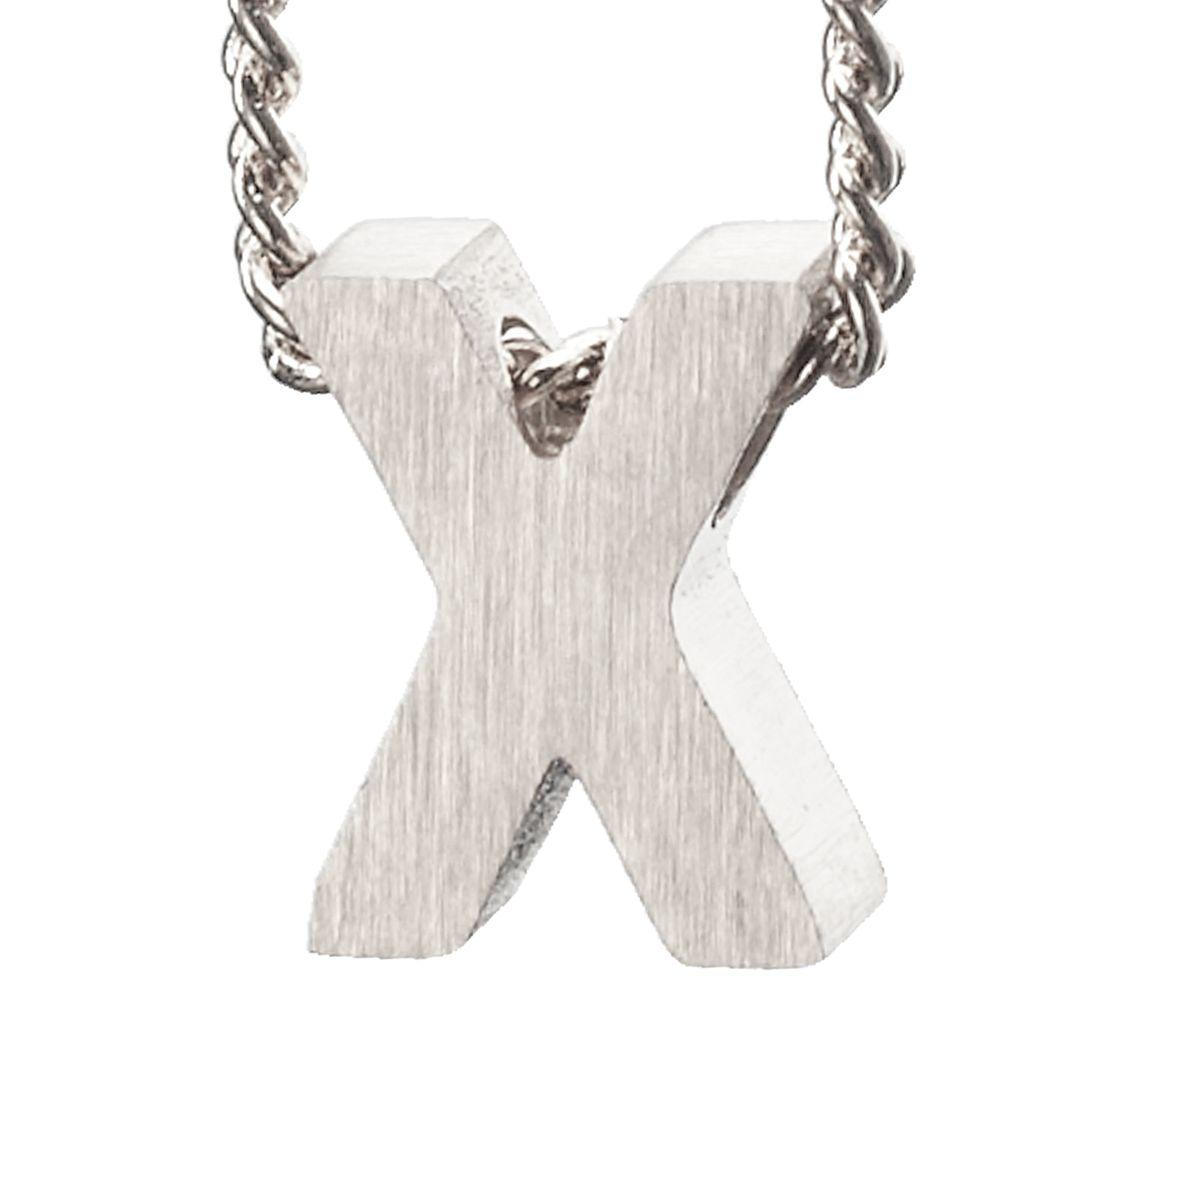 Breloque lettre X - argenté (Maat Onesize) - LUZ - Modalova